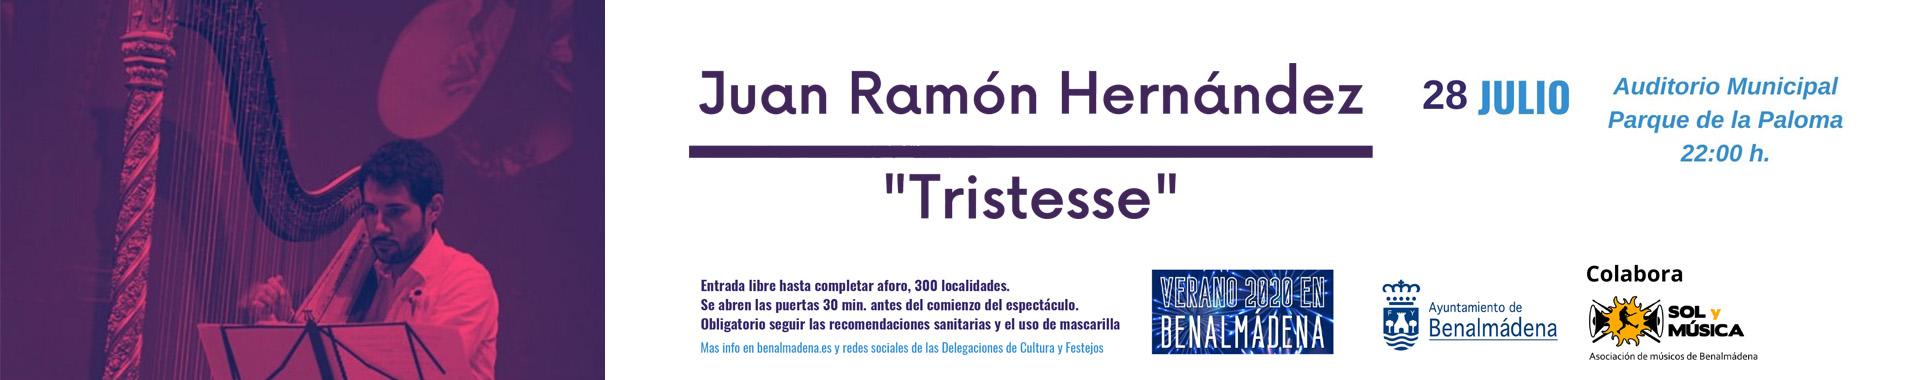 Juan Ramón Hernández - Tristesse